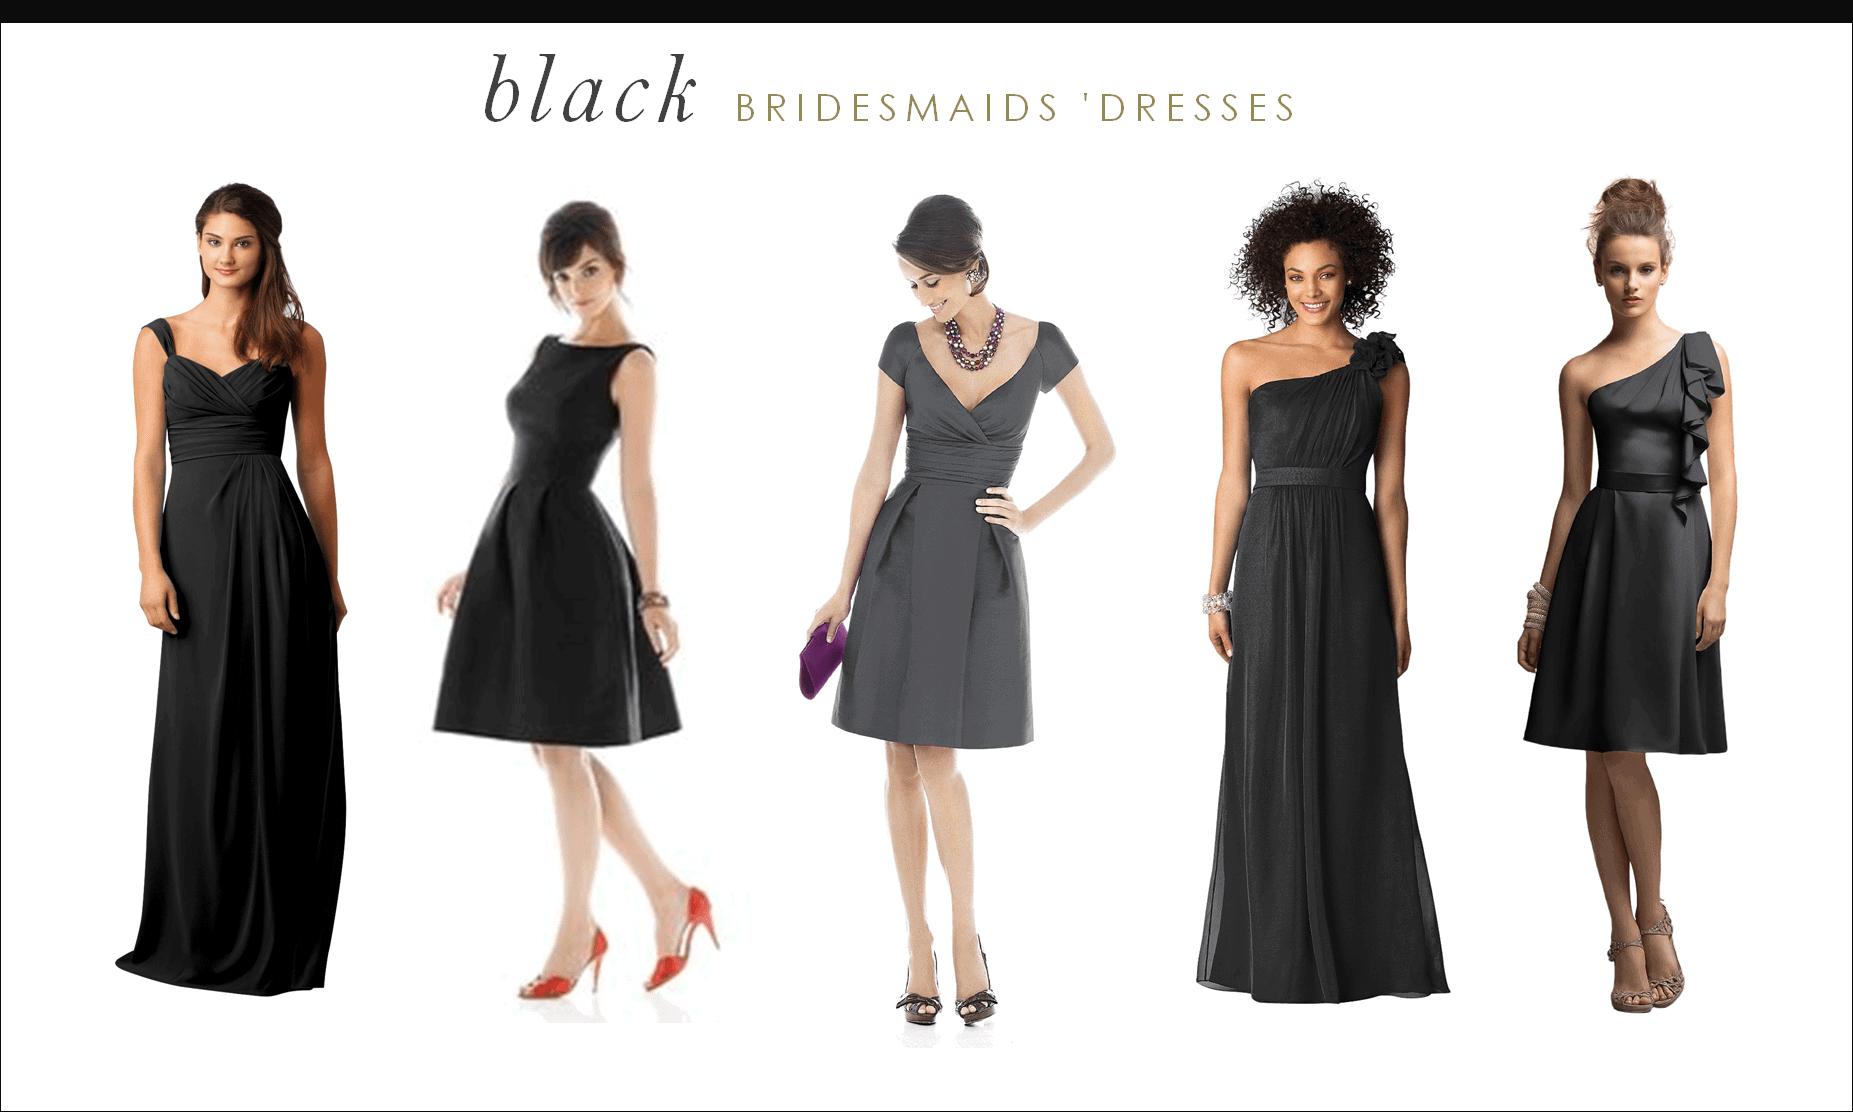 Reader Request Black Bridesmaids Dresses